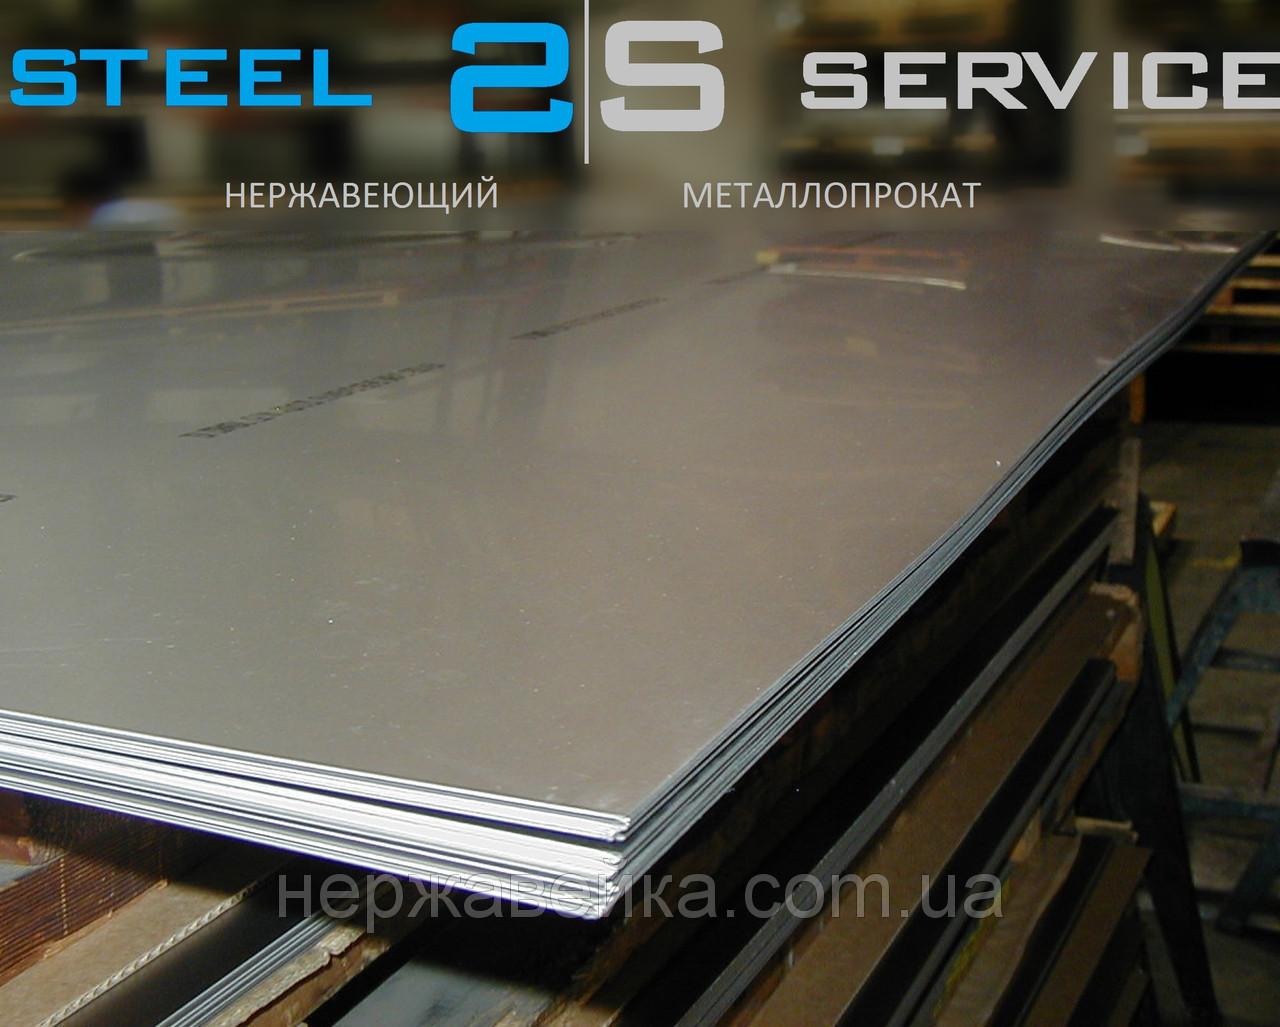 Нержавеющий лист 2х1000х2000мм  AISI 316Ti(10Х17Н13М2Т) BA - зеркало,  кислотостойкий